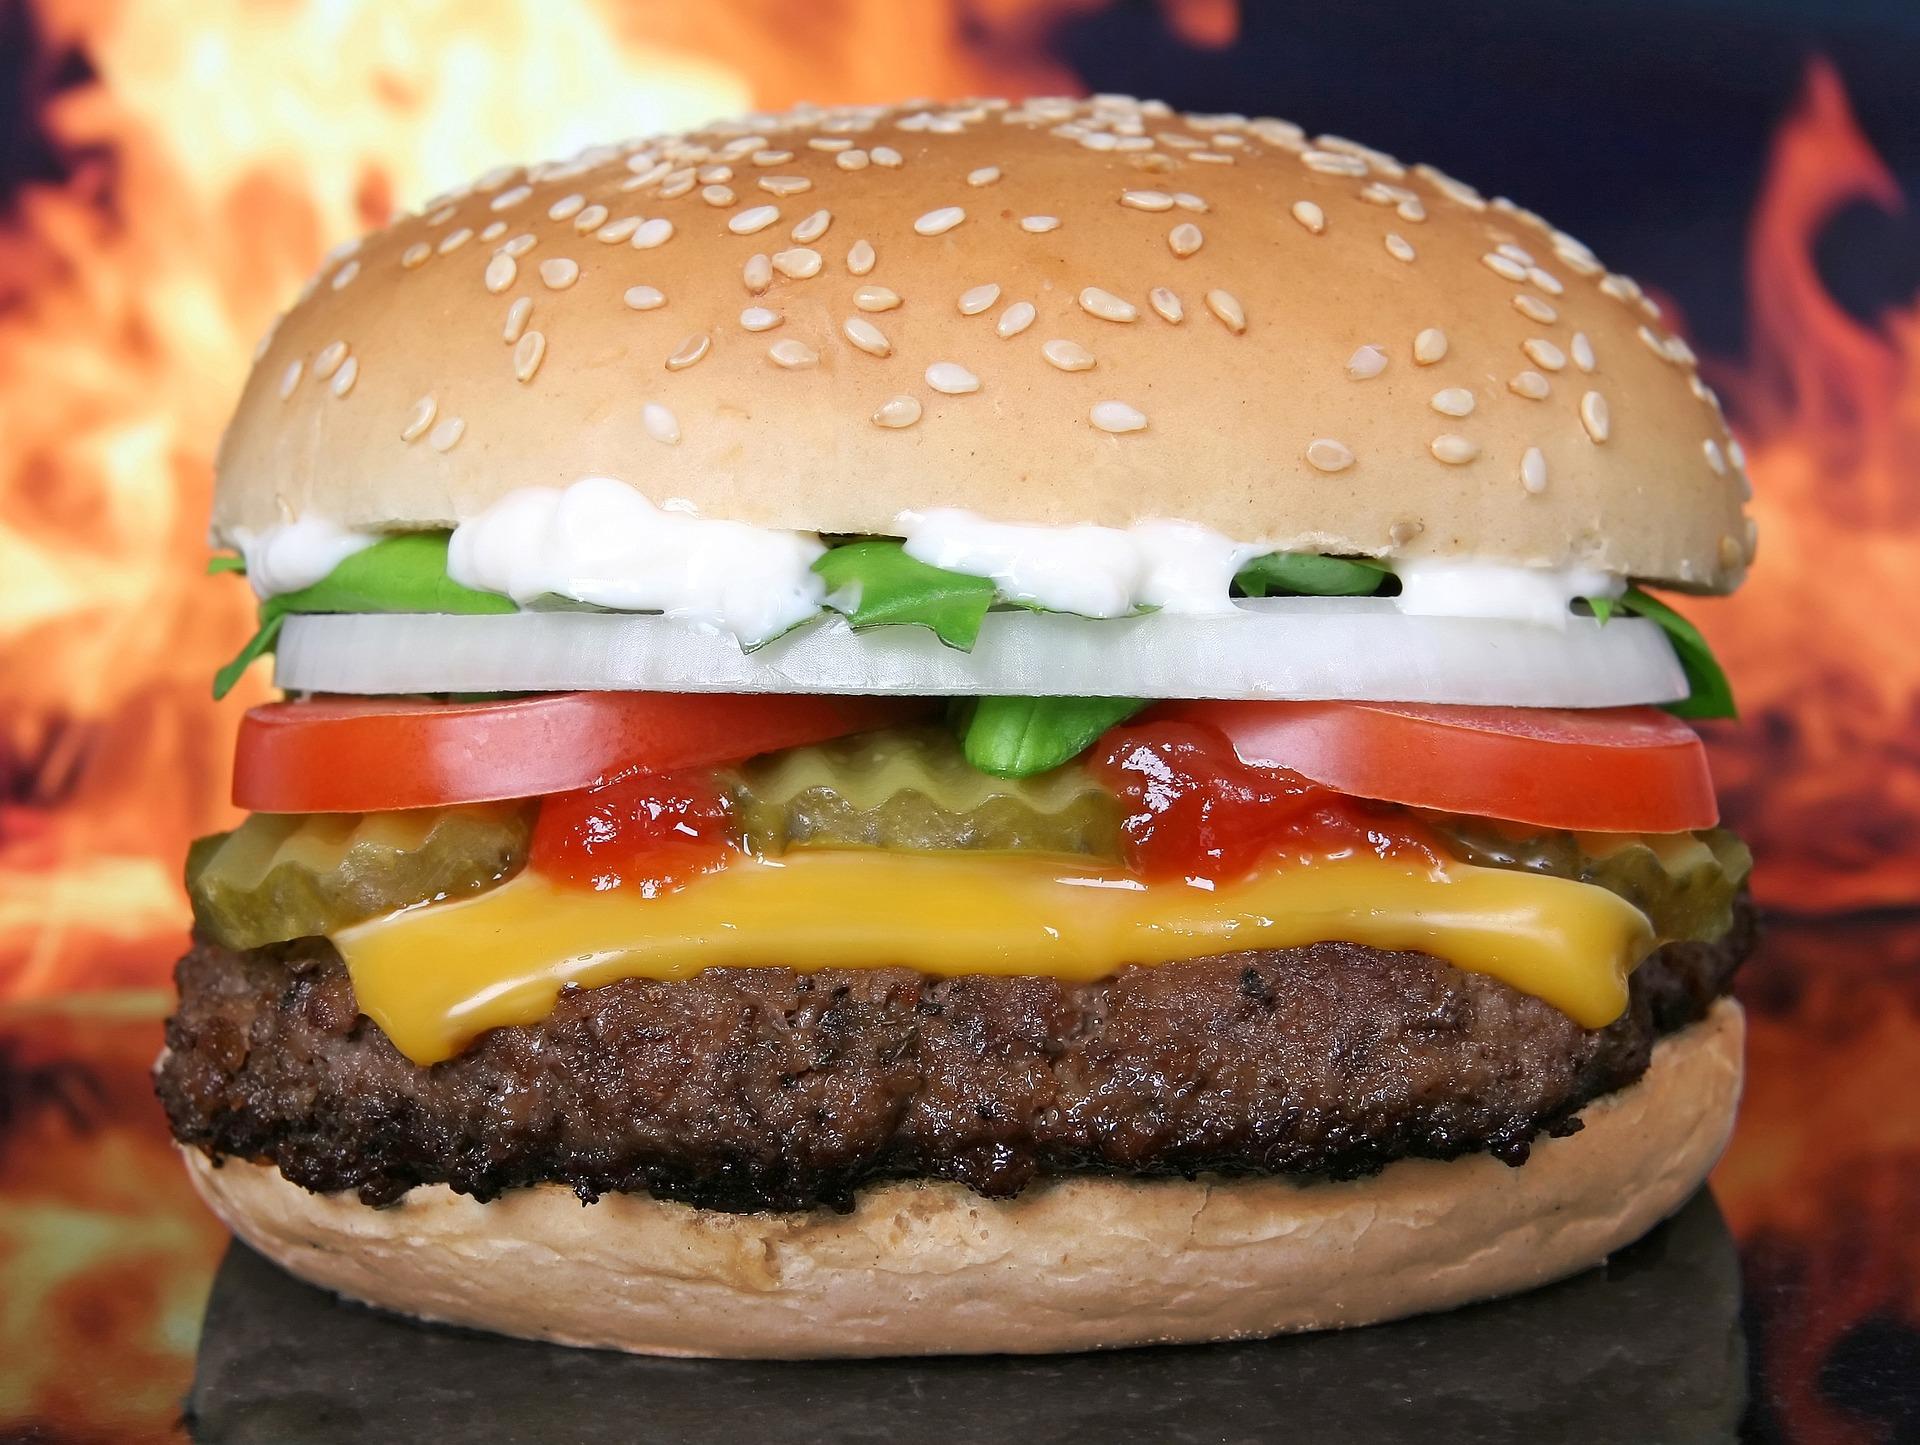 Les comptes de calories de McDonald's ne valent rien !